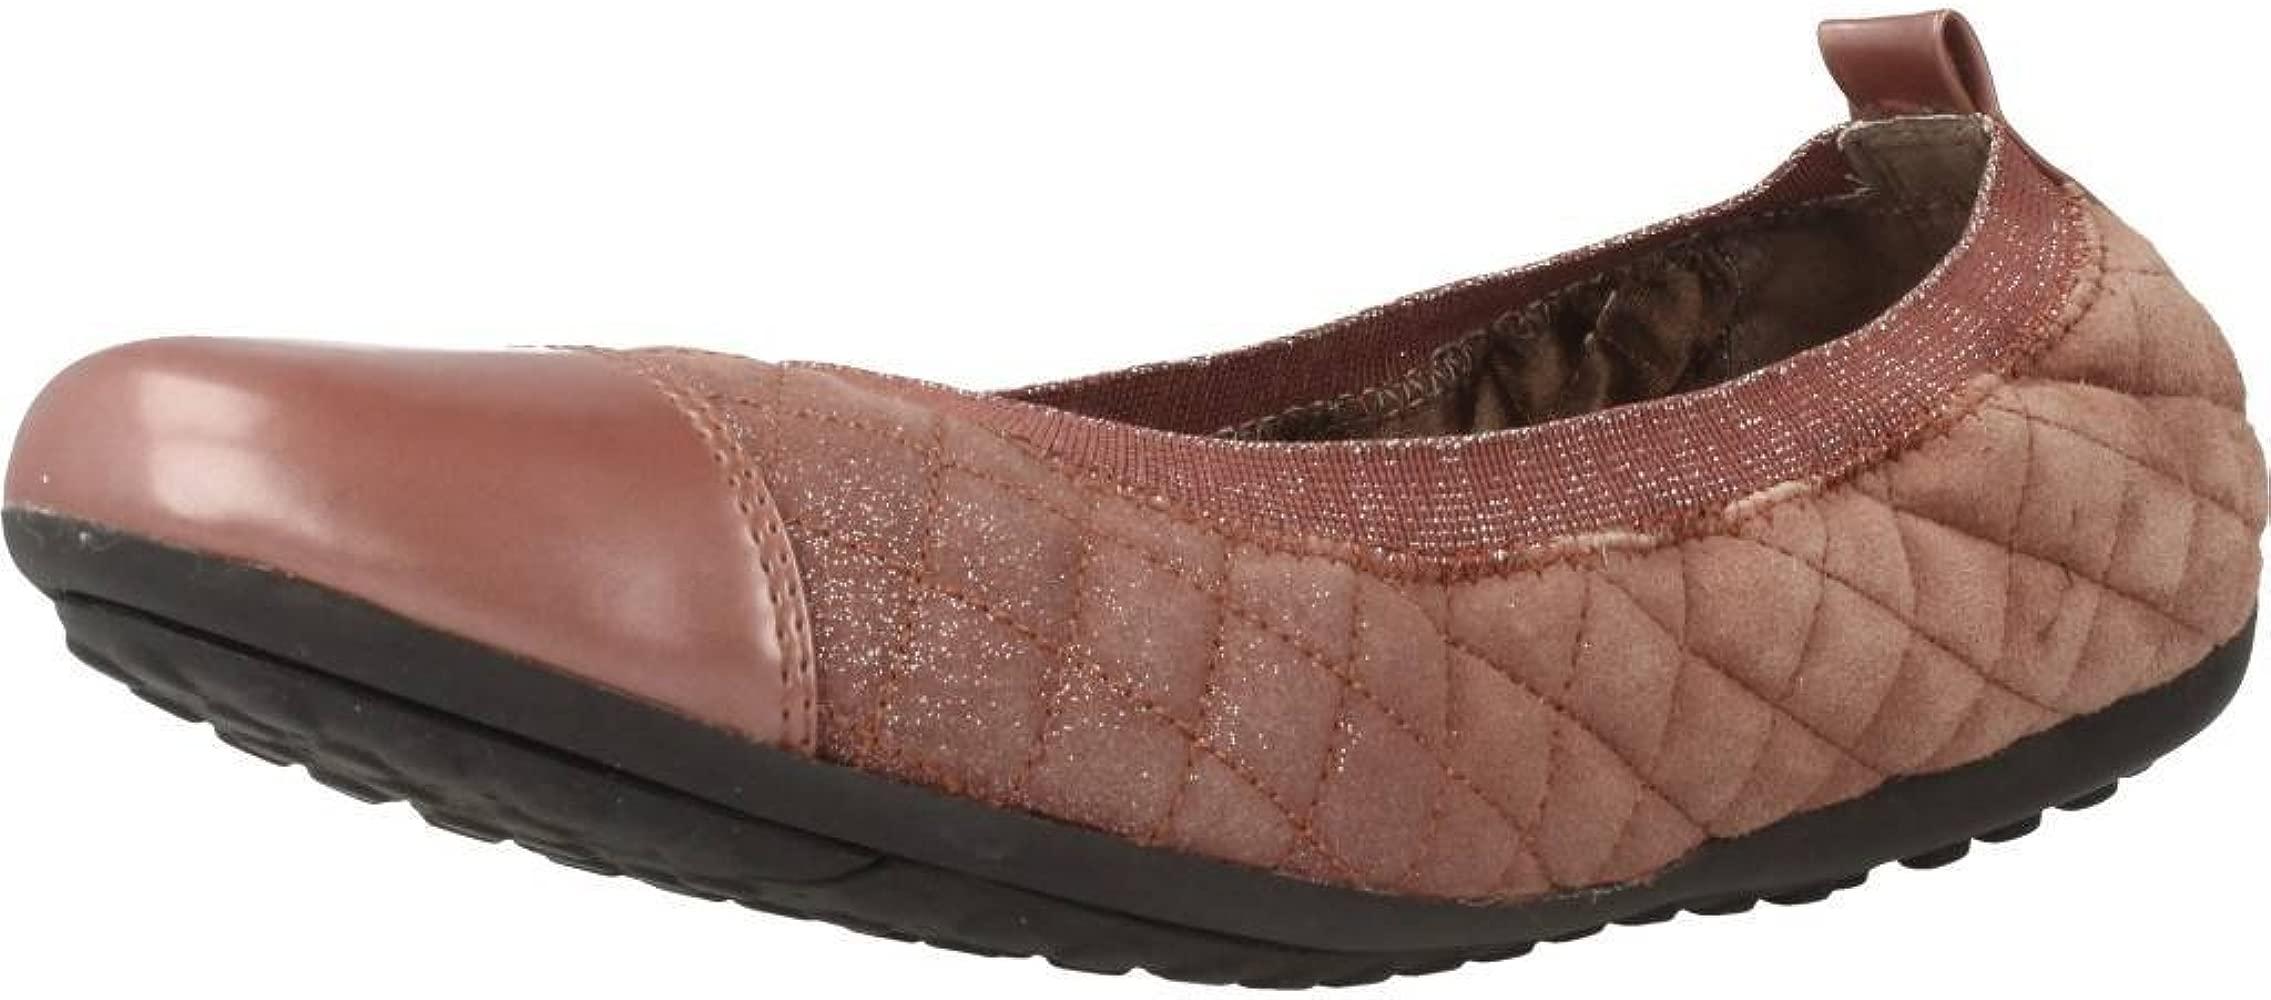 subasta Mujer hermosa herramienta  Zapatos Bailarina para Mujer, Color Rosa, Marca GEOX, Modelo ...